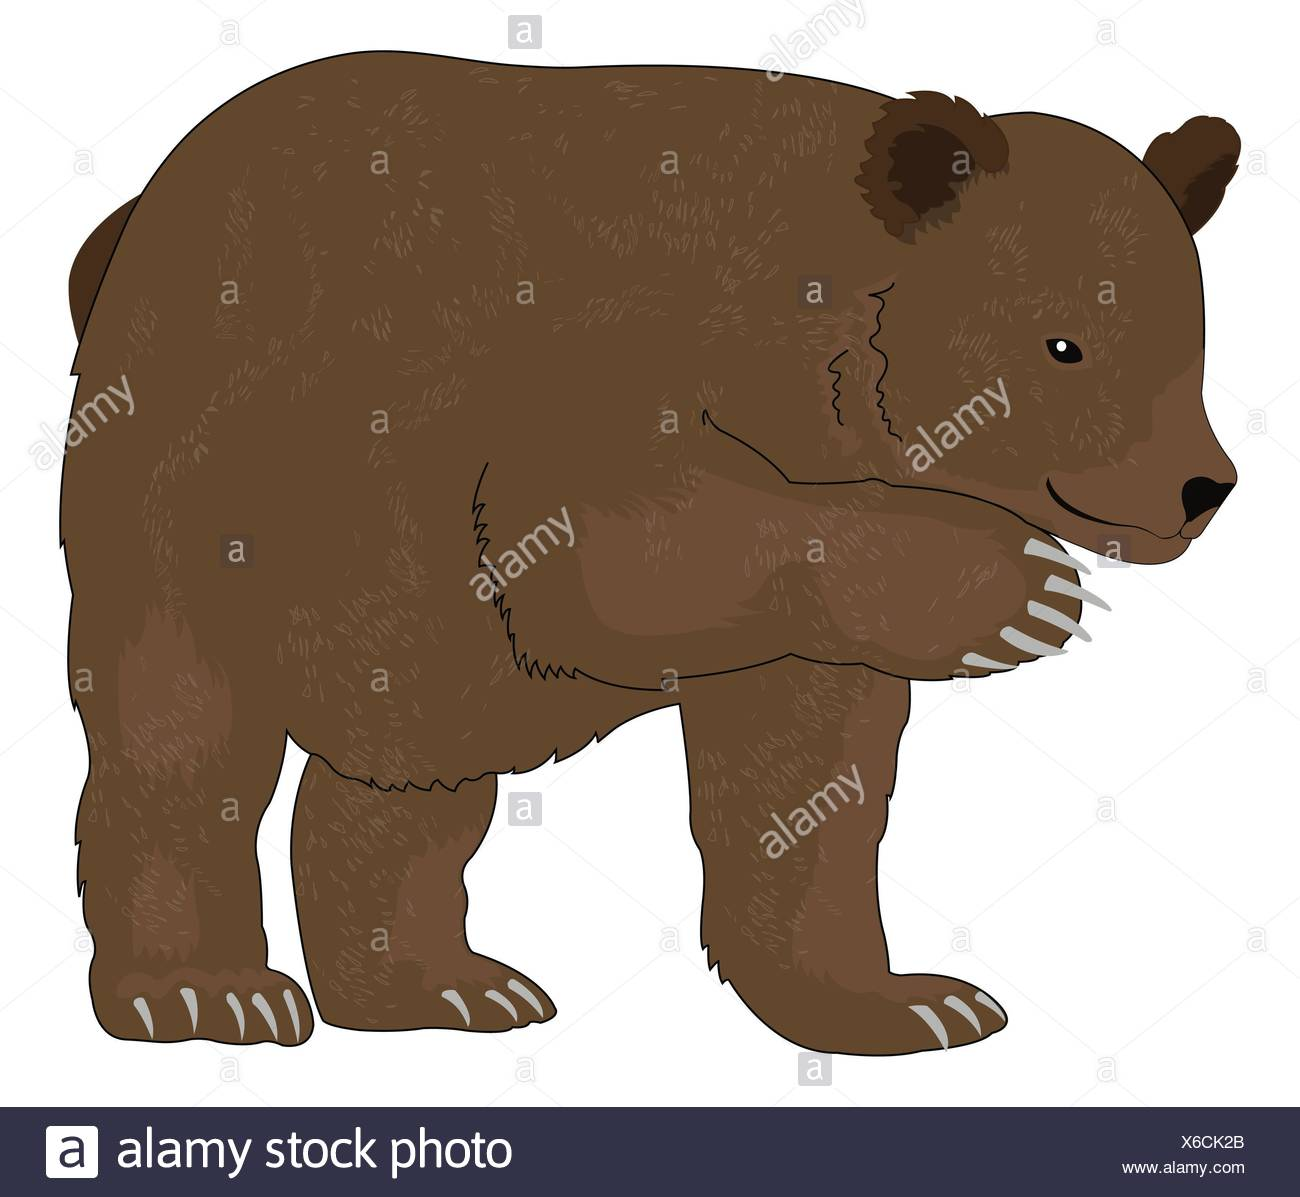 Bear or Ursus arctos, Brown, vector illustration Stock Photo